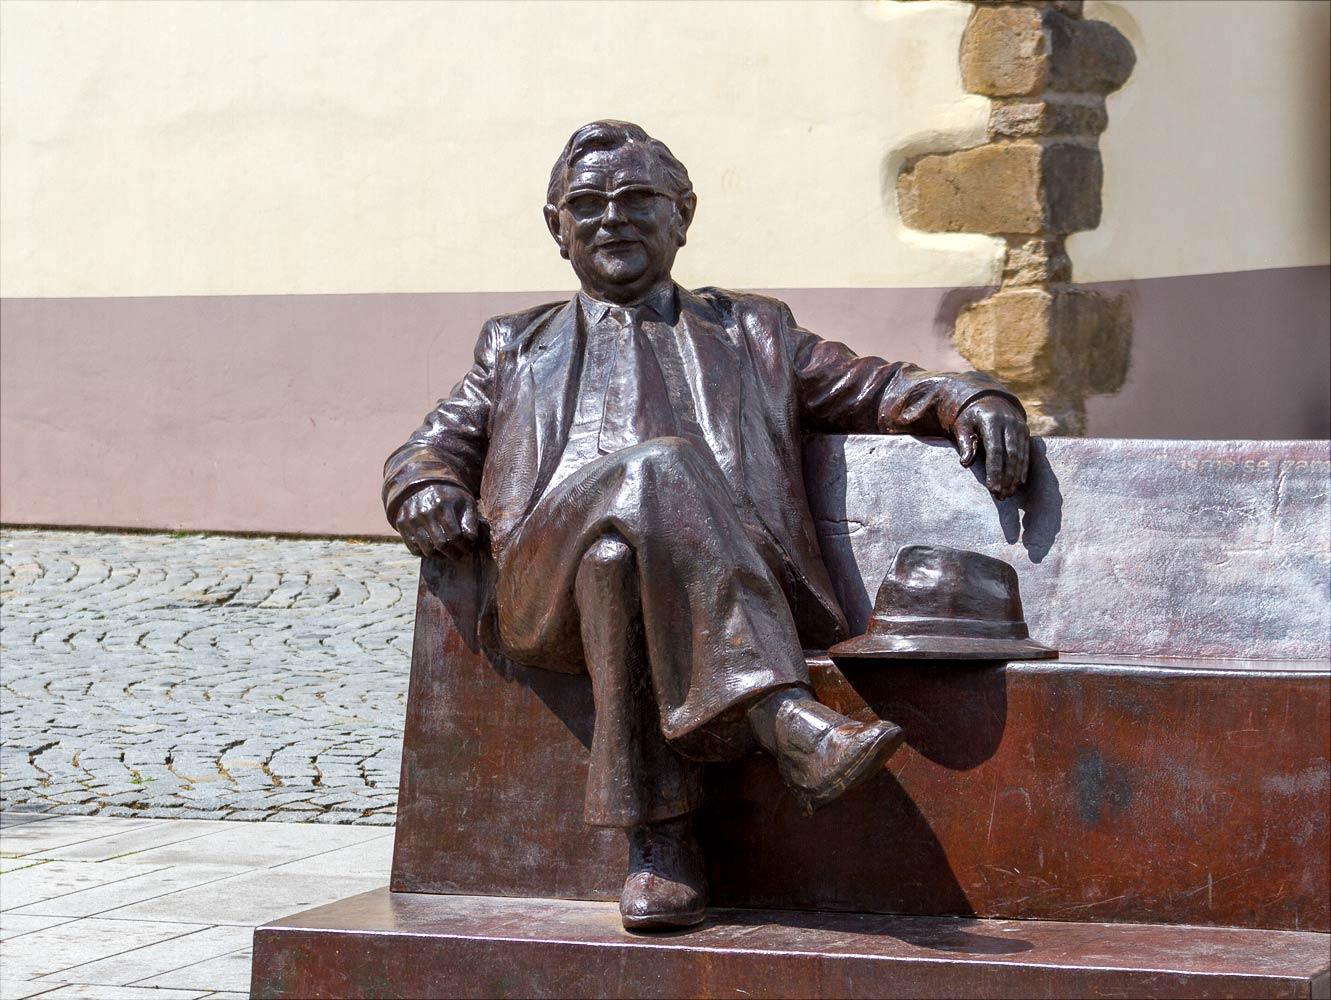 Памятник писателю Йозефу Шкворецкому в Находе